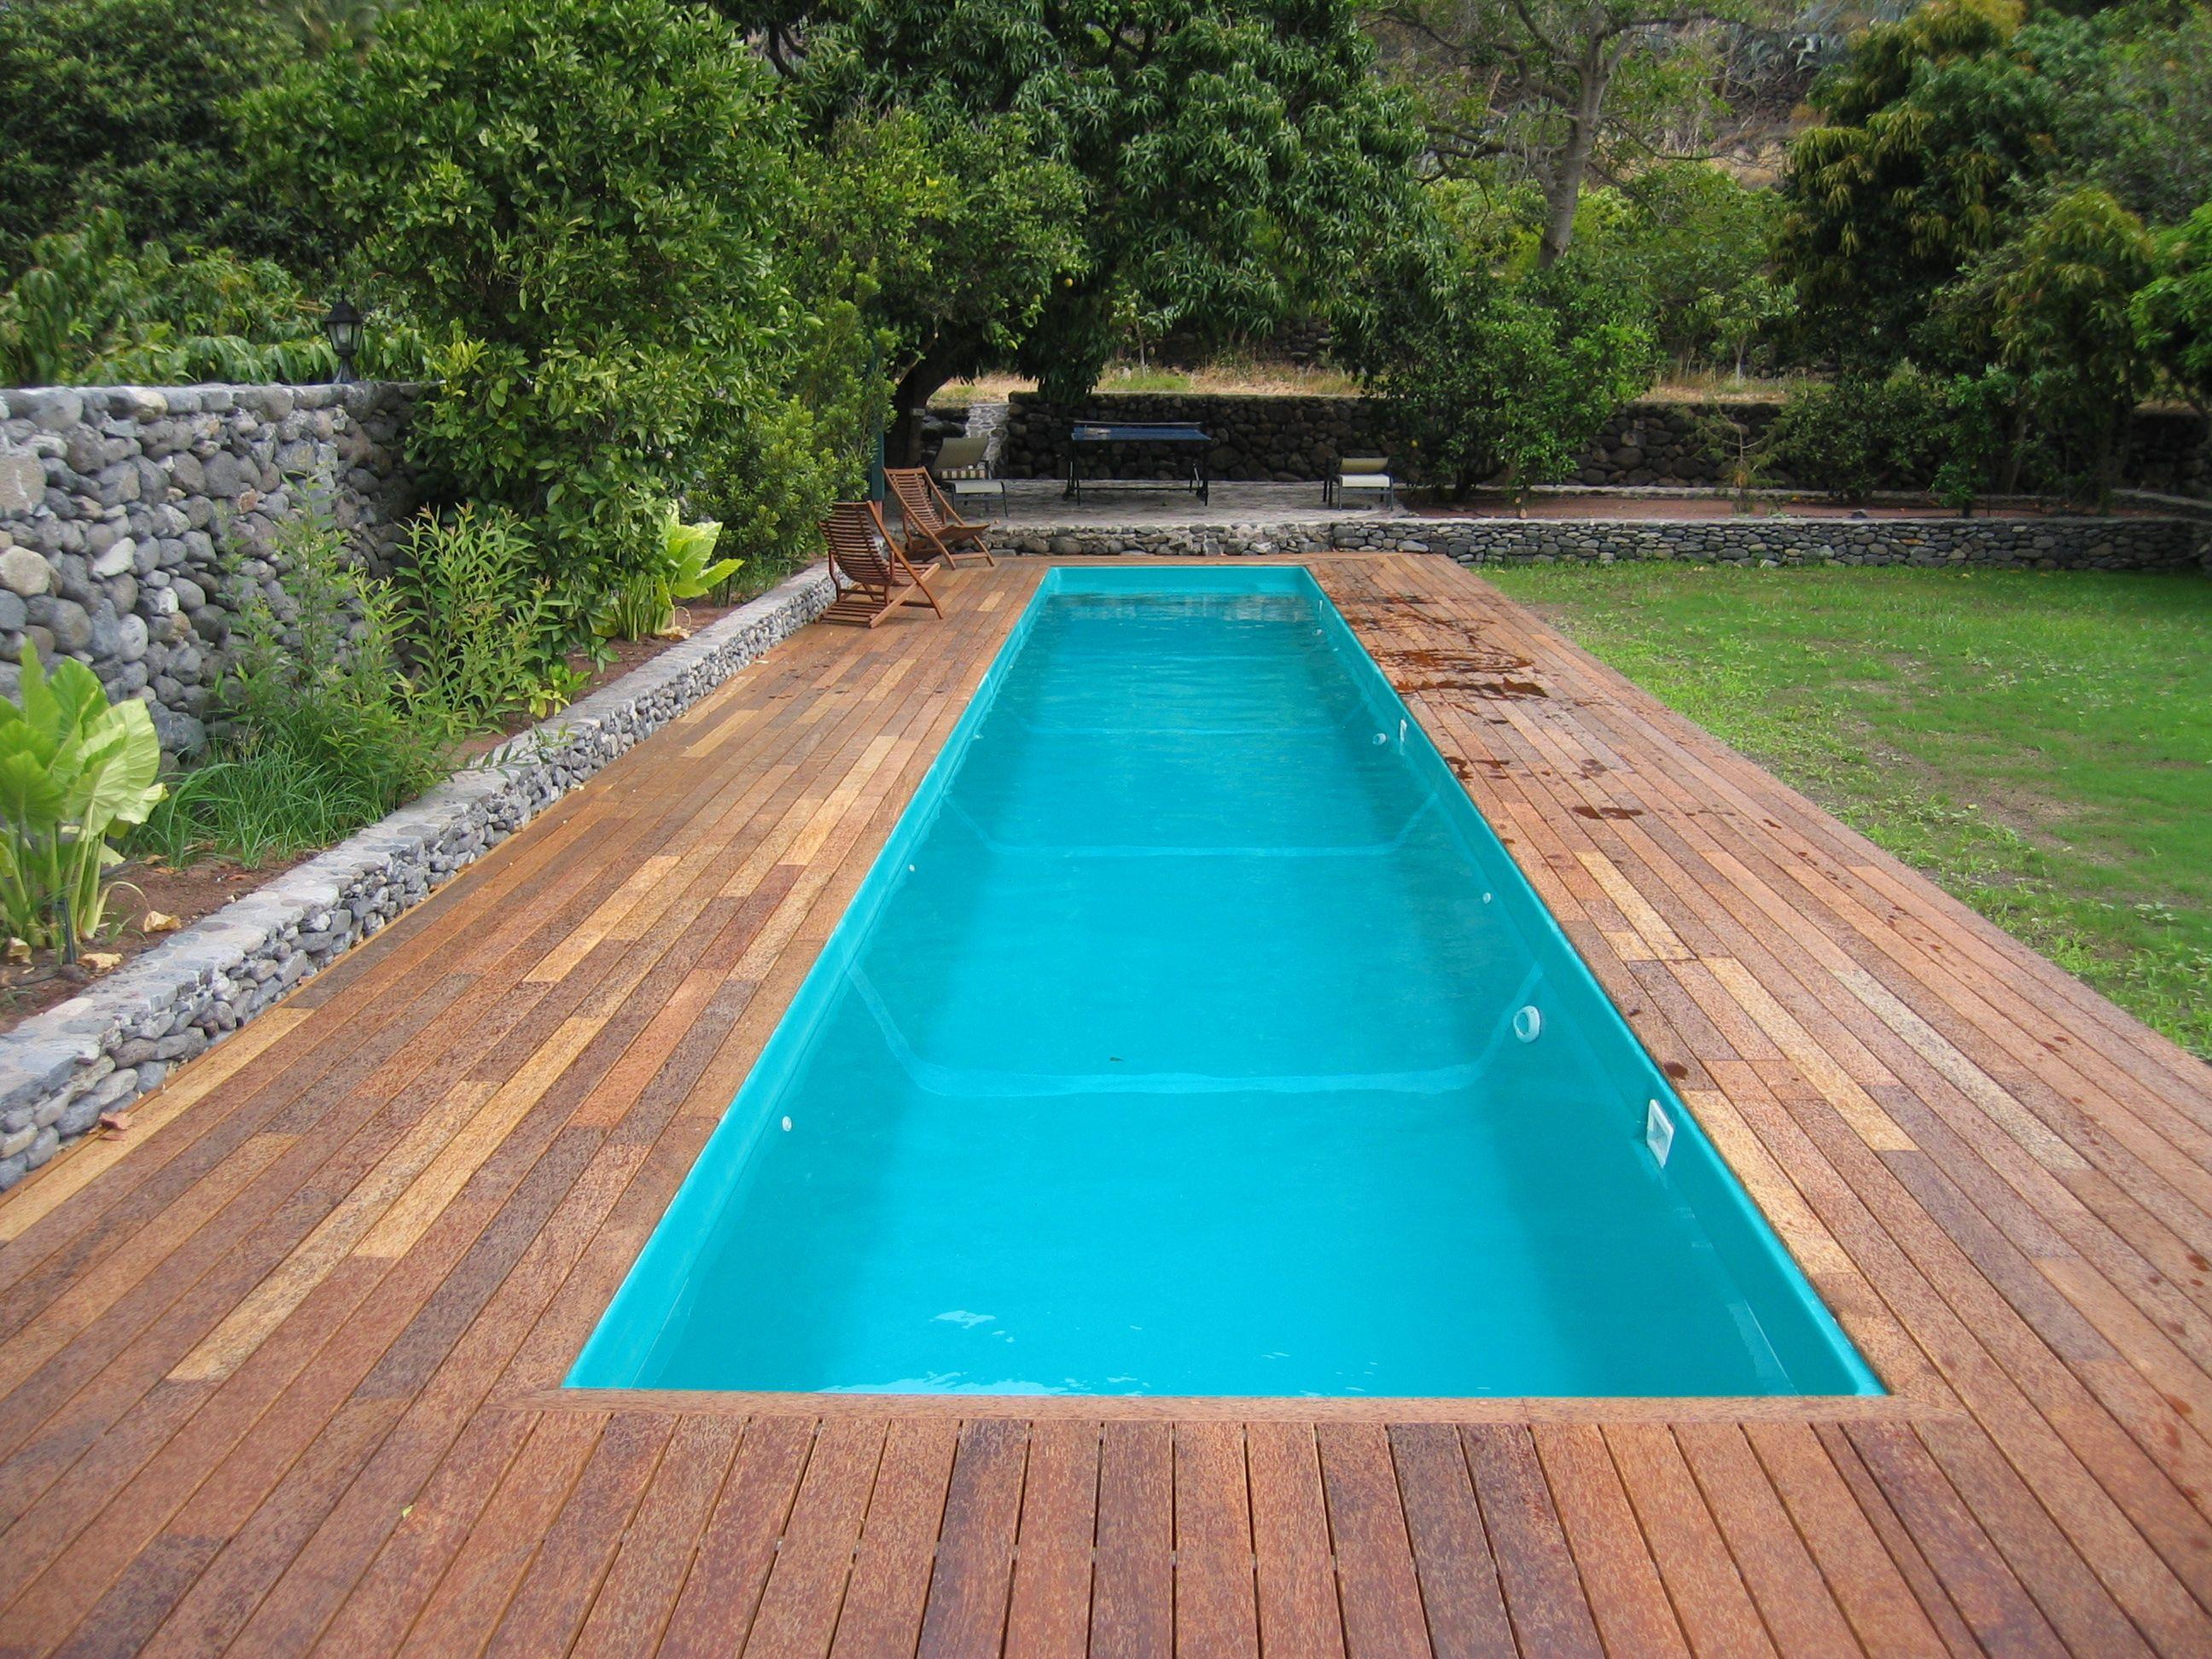 C mo poner tu piscina a punto seg n sea hormig n o - Piscinas prefabricadas de hormigon ...